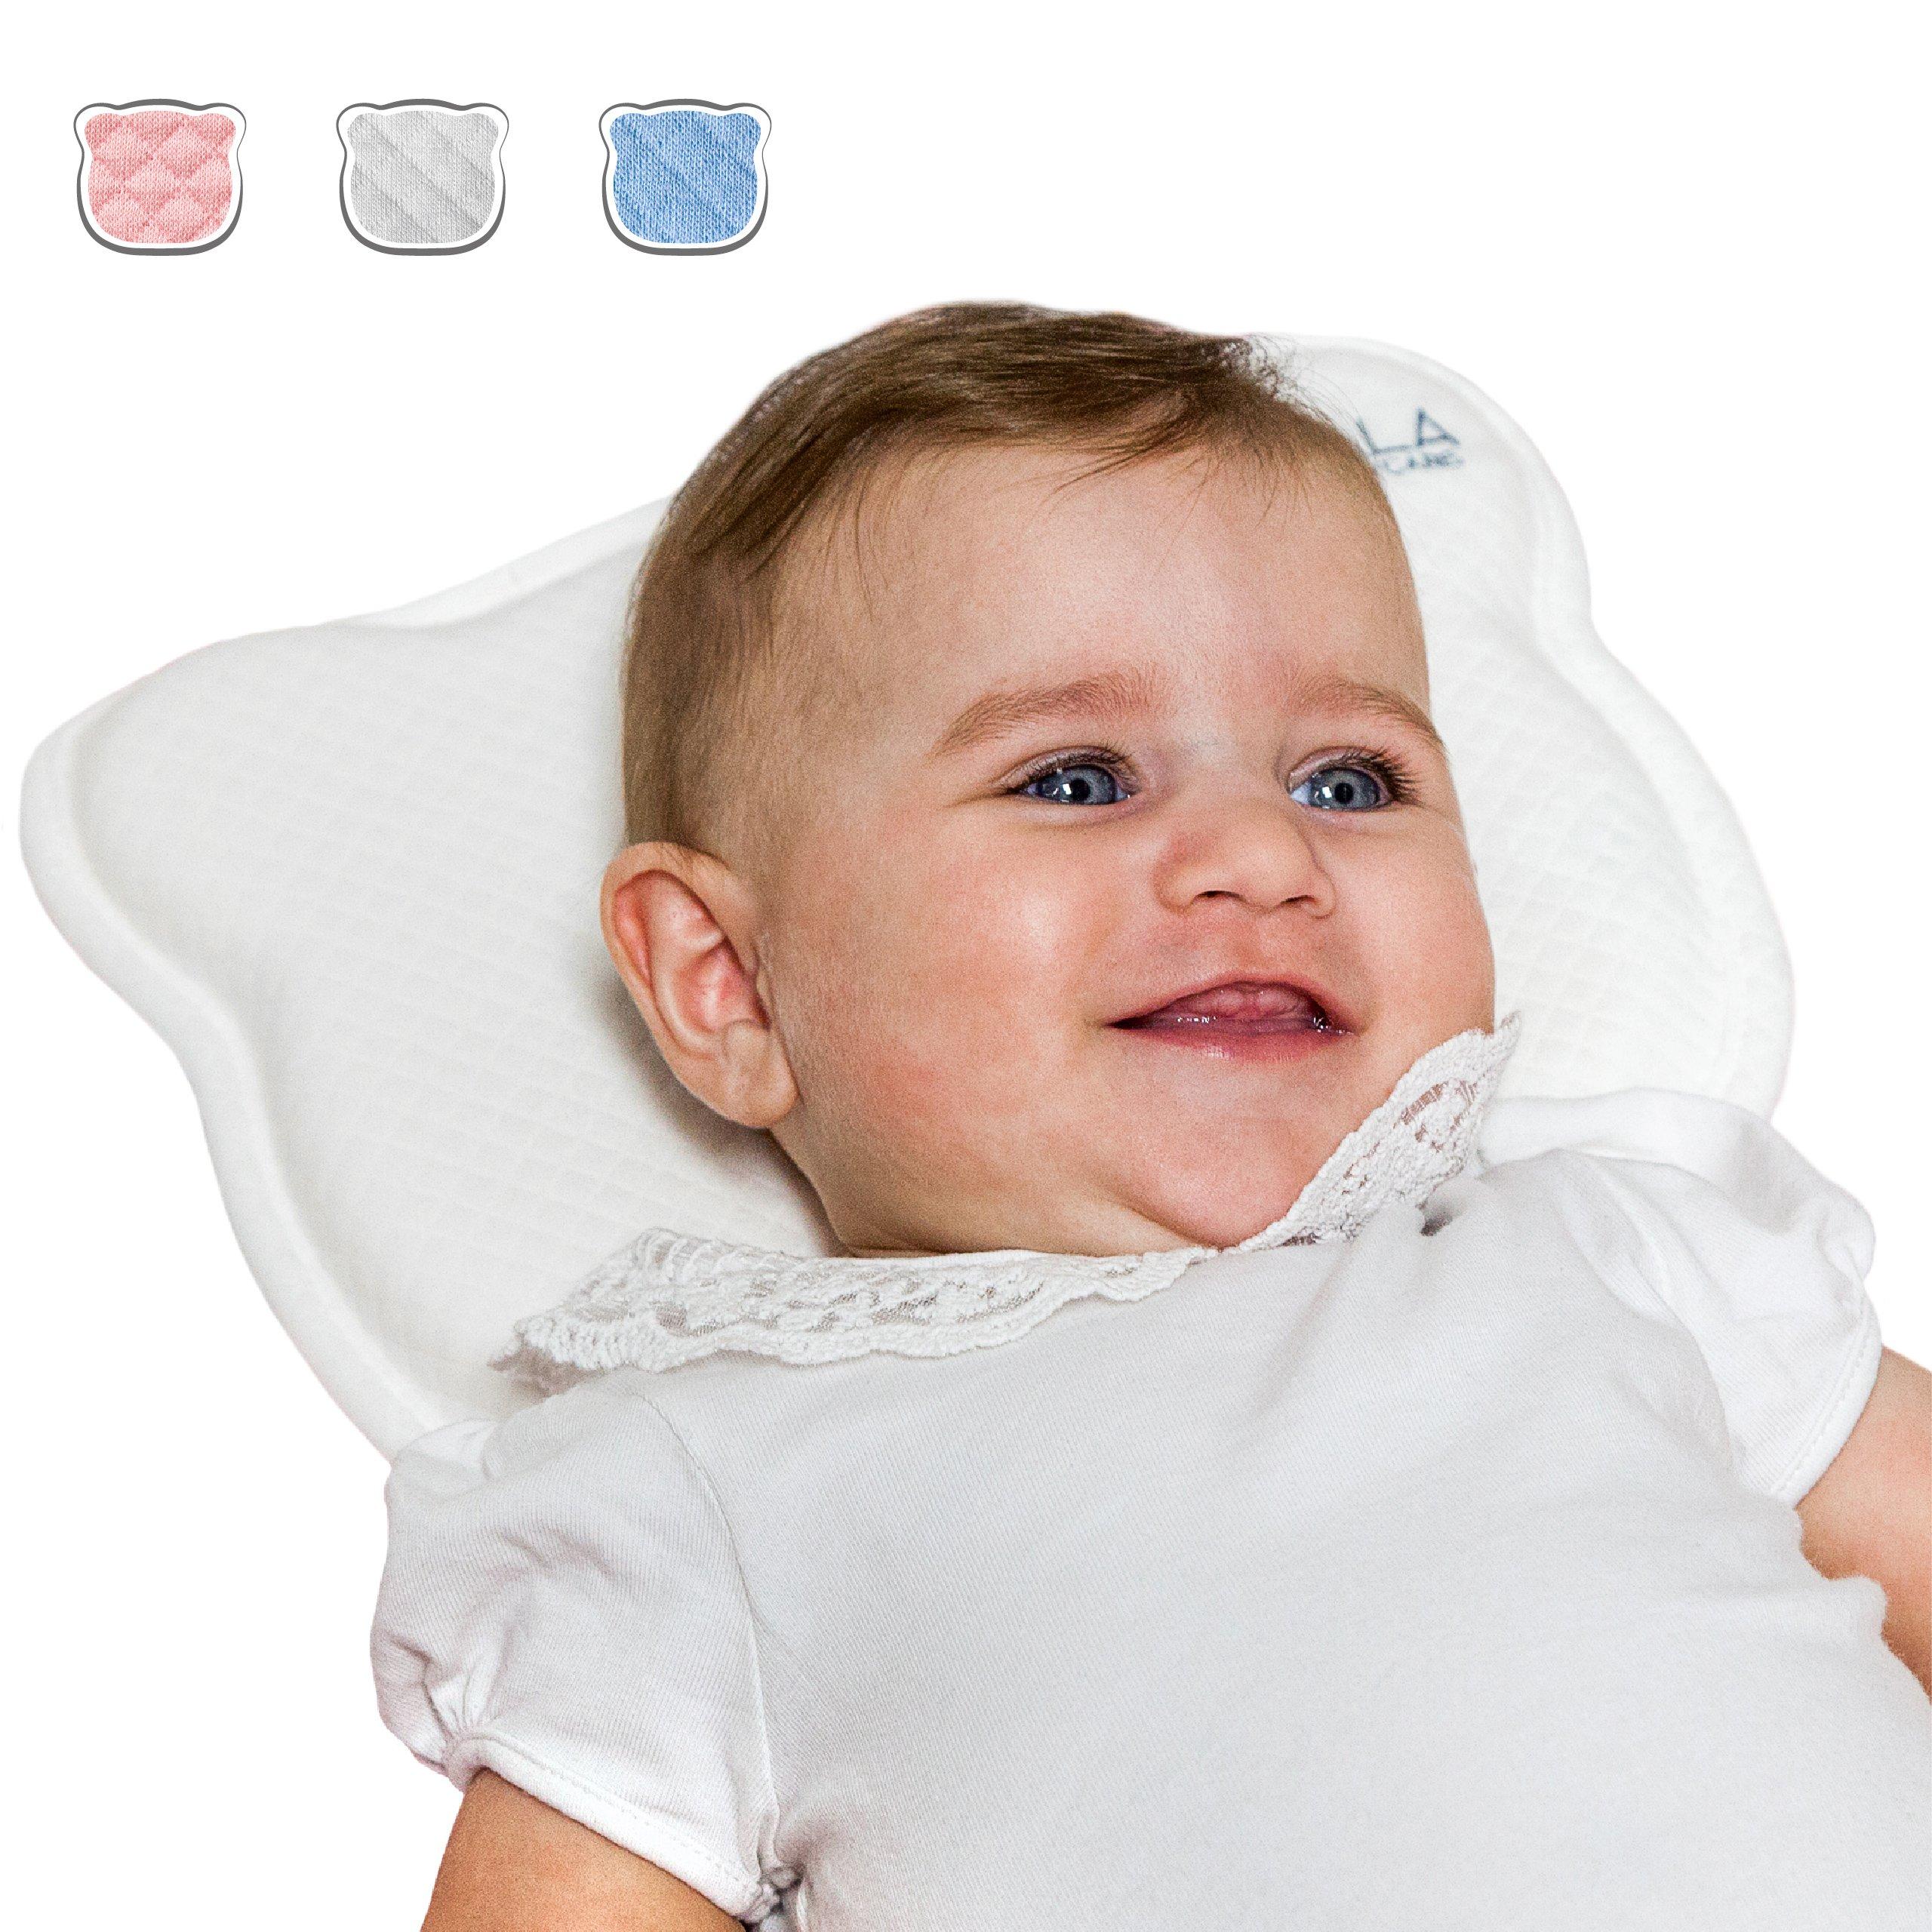 Almohada para Bebe para plagiocefalia desenfundable (con dos forros) para prevenir/curar la Cabeza Plana in Memory Foam Antiasfixia - KoalaBabycare® ...